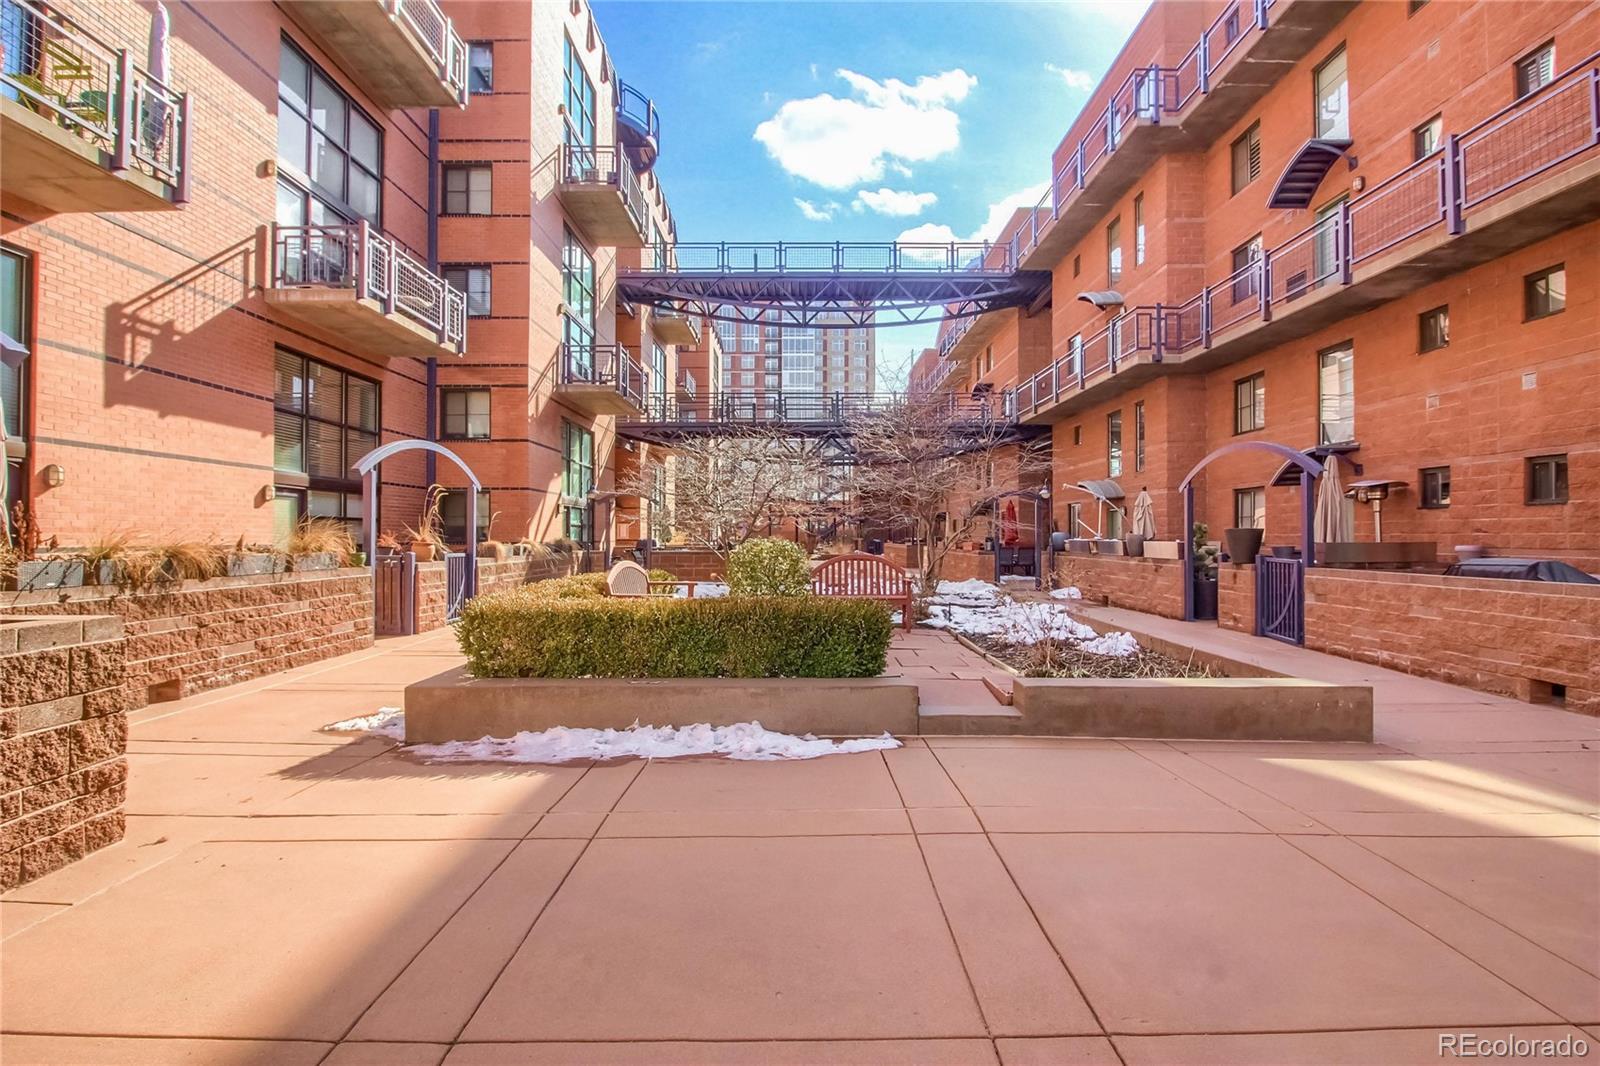 MLS# 5211975 - 32 - 930 Acoma Street #315, Denver, CO 80204